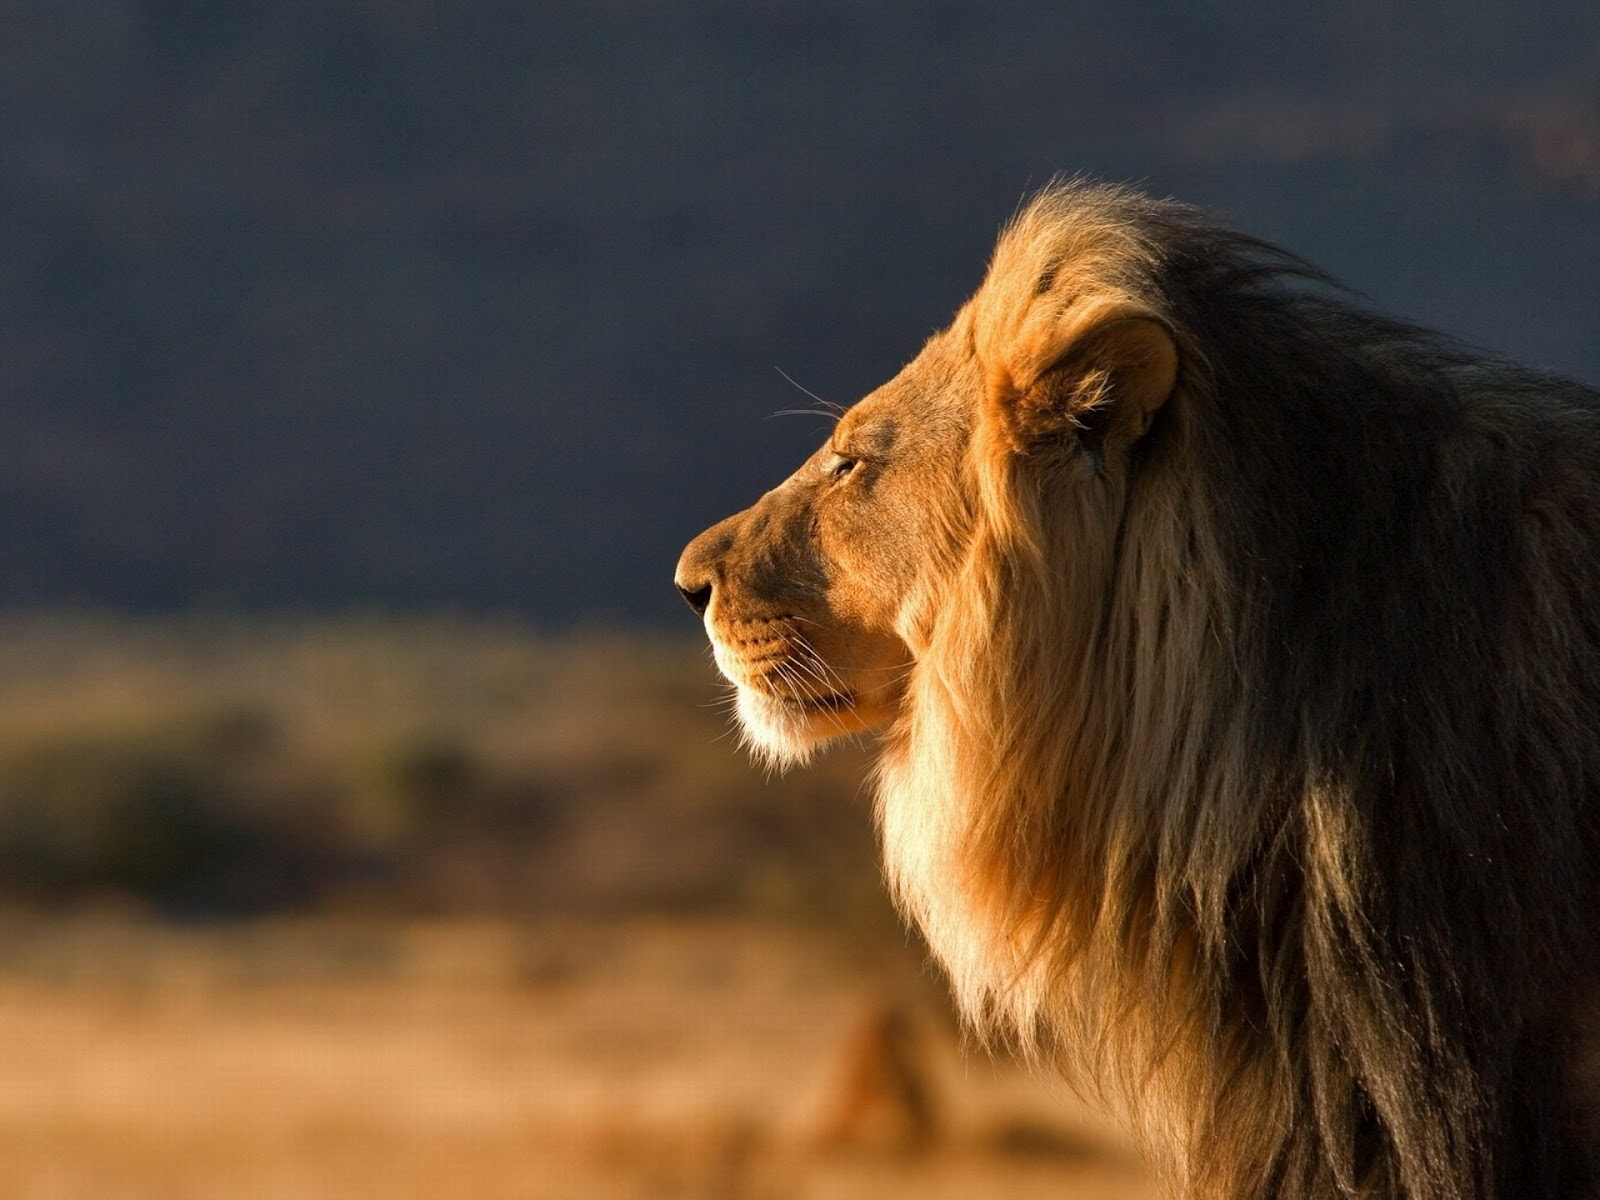 Wonderful   Wallpaper Horse Lion - Male+Lion+Wallpapers+13  Photograph_429177.jpg